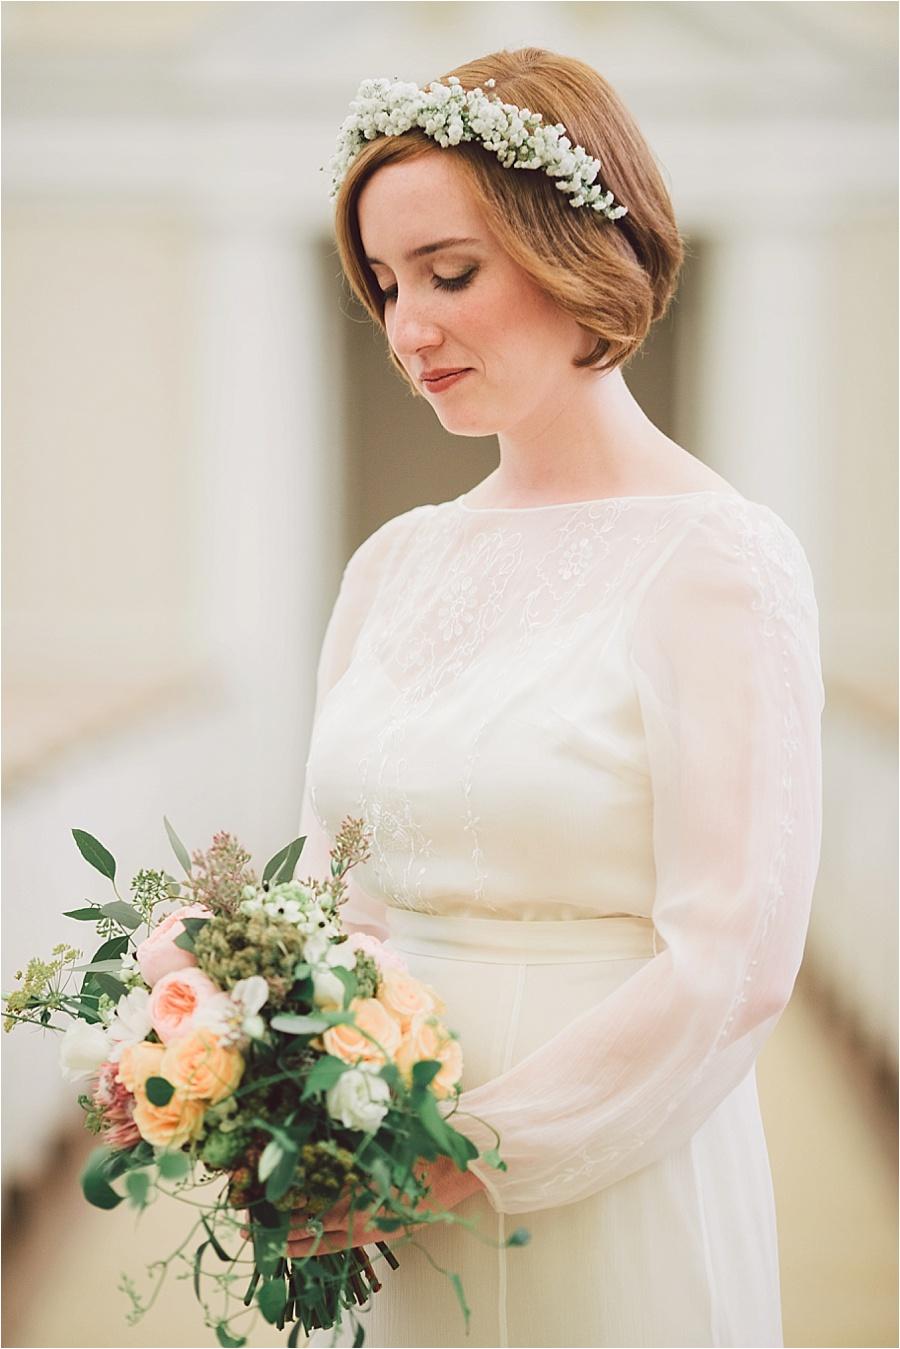 CK-Photo-Nashville-Wedding-Photographer-b_0068.jpg